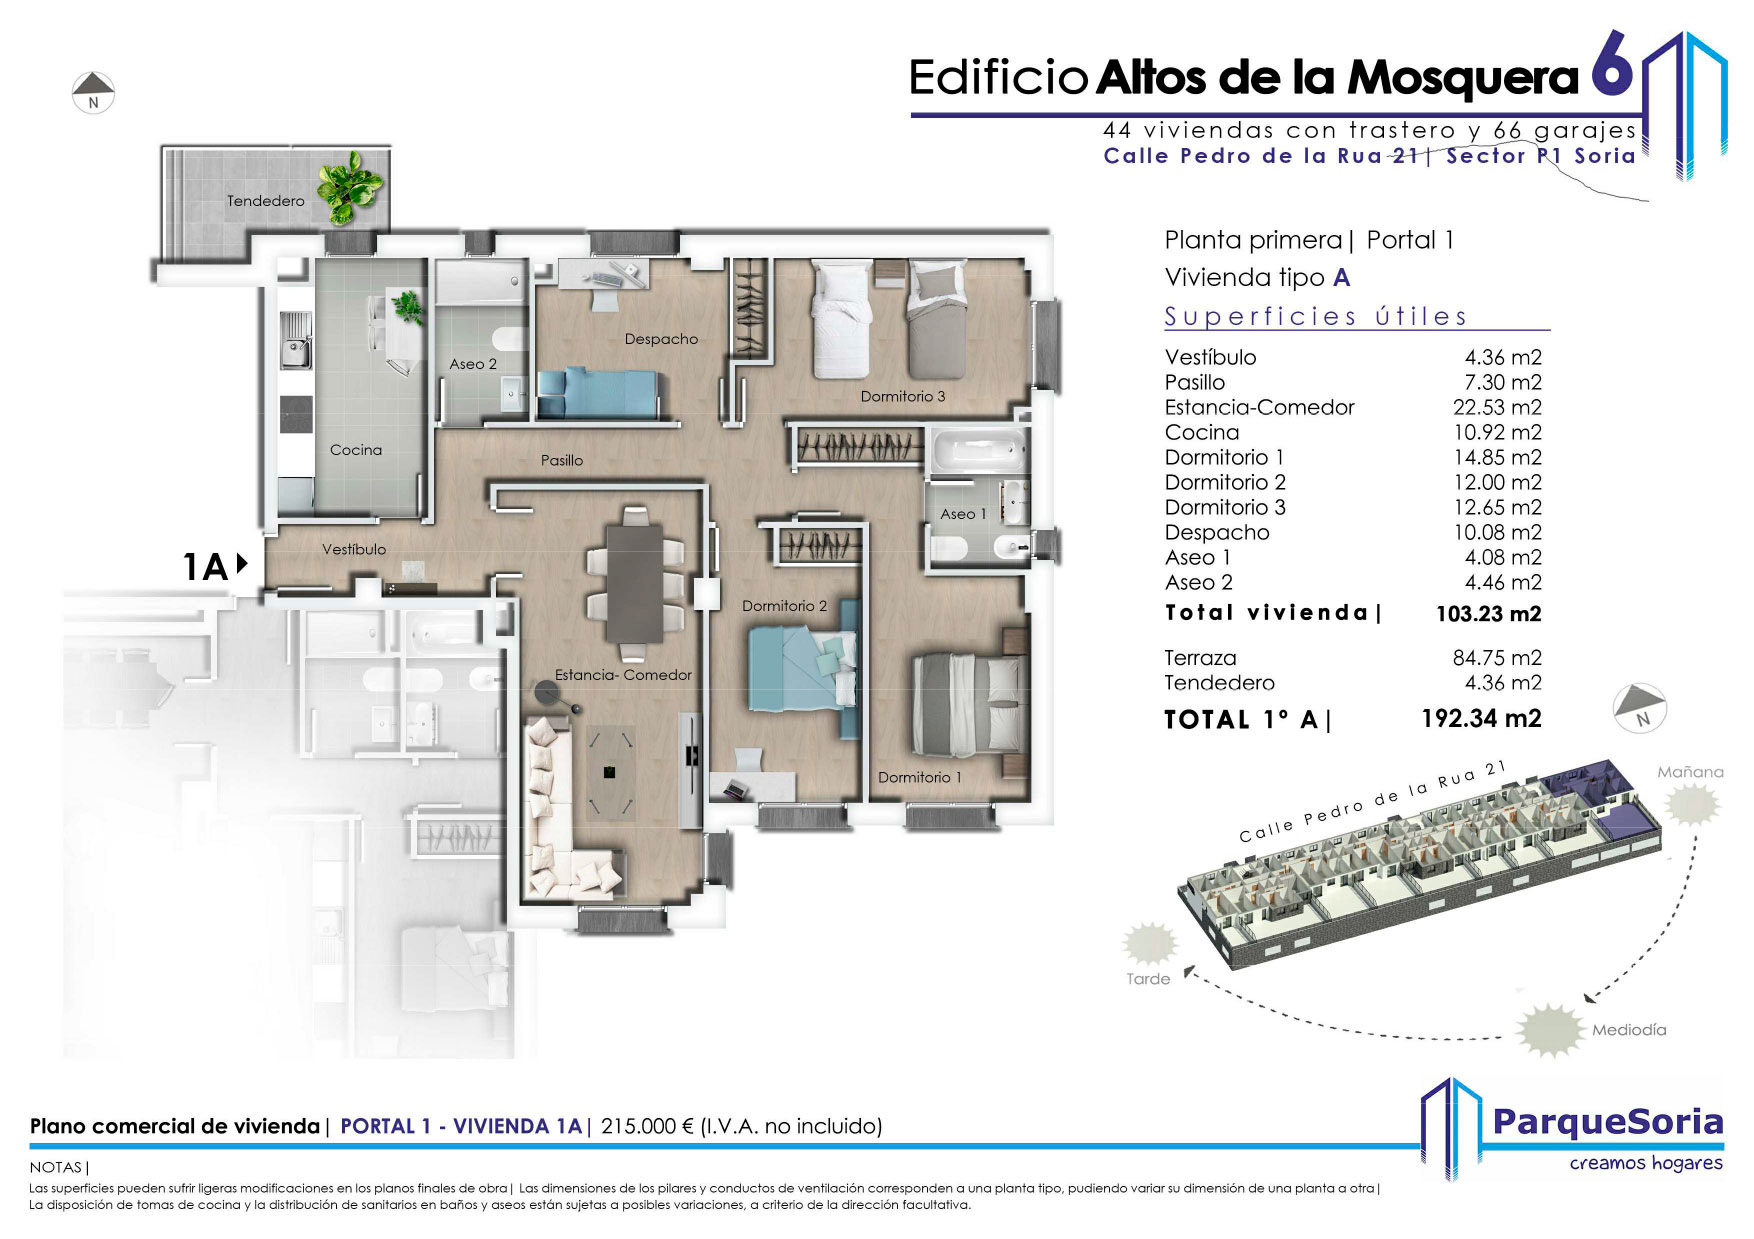 Parquesoria-Altos-de-la-mosquera-6-1A-1